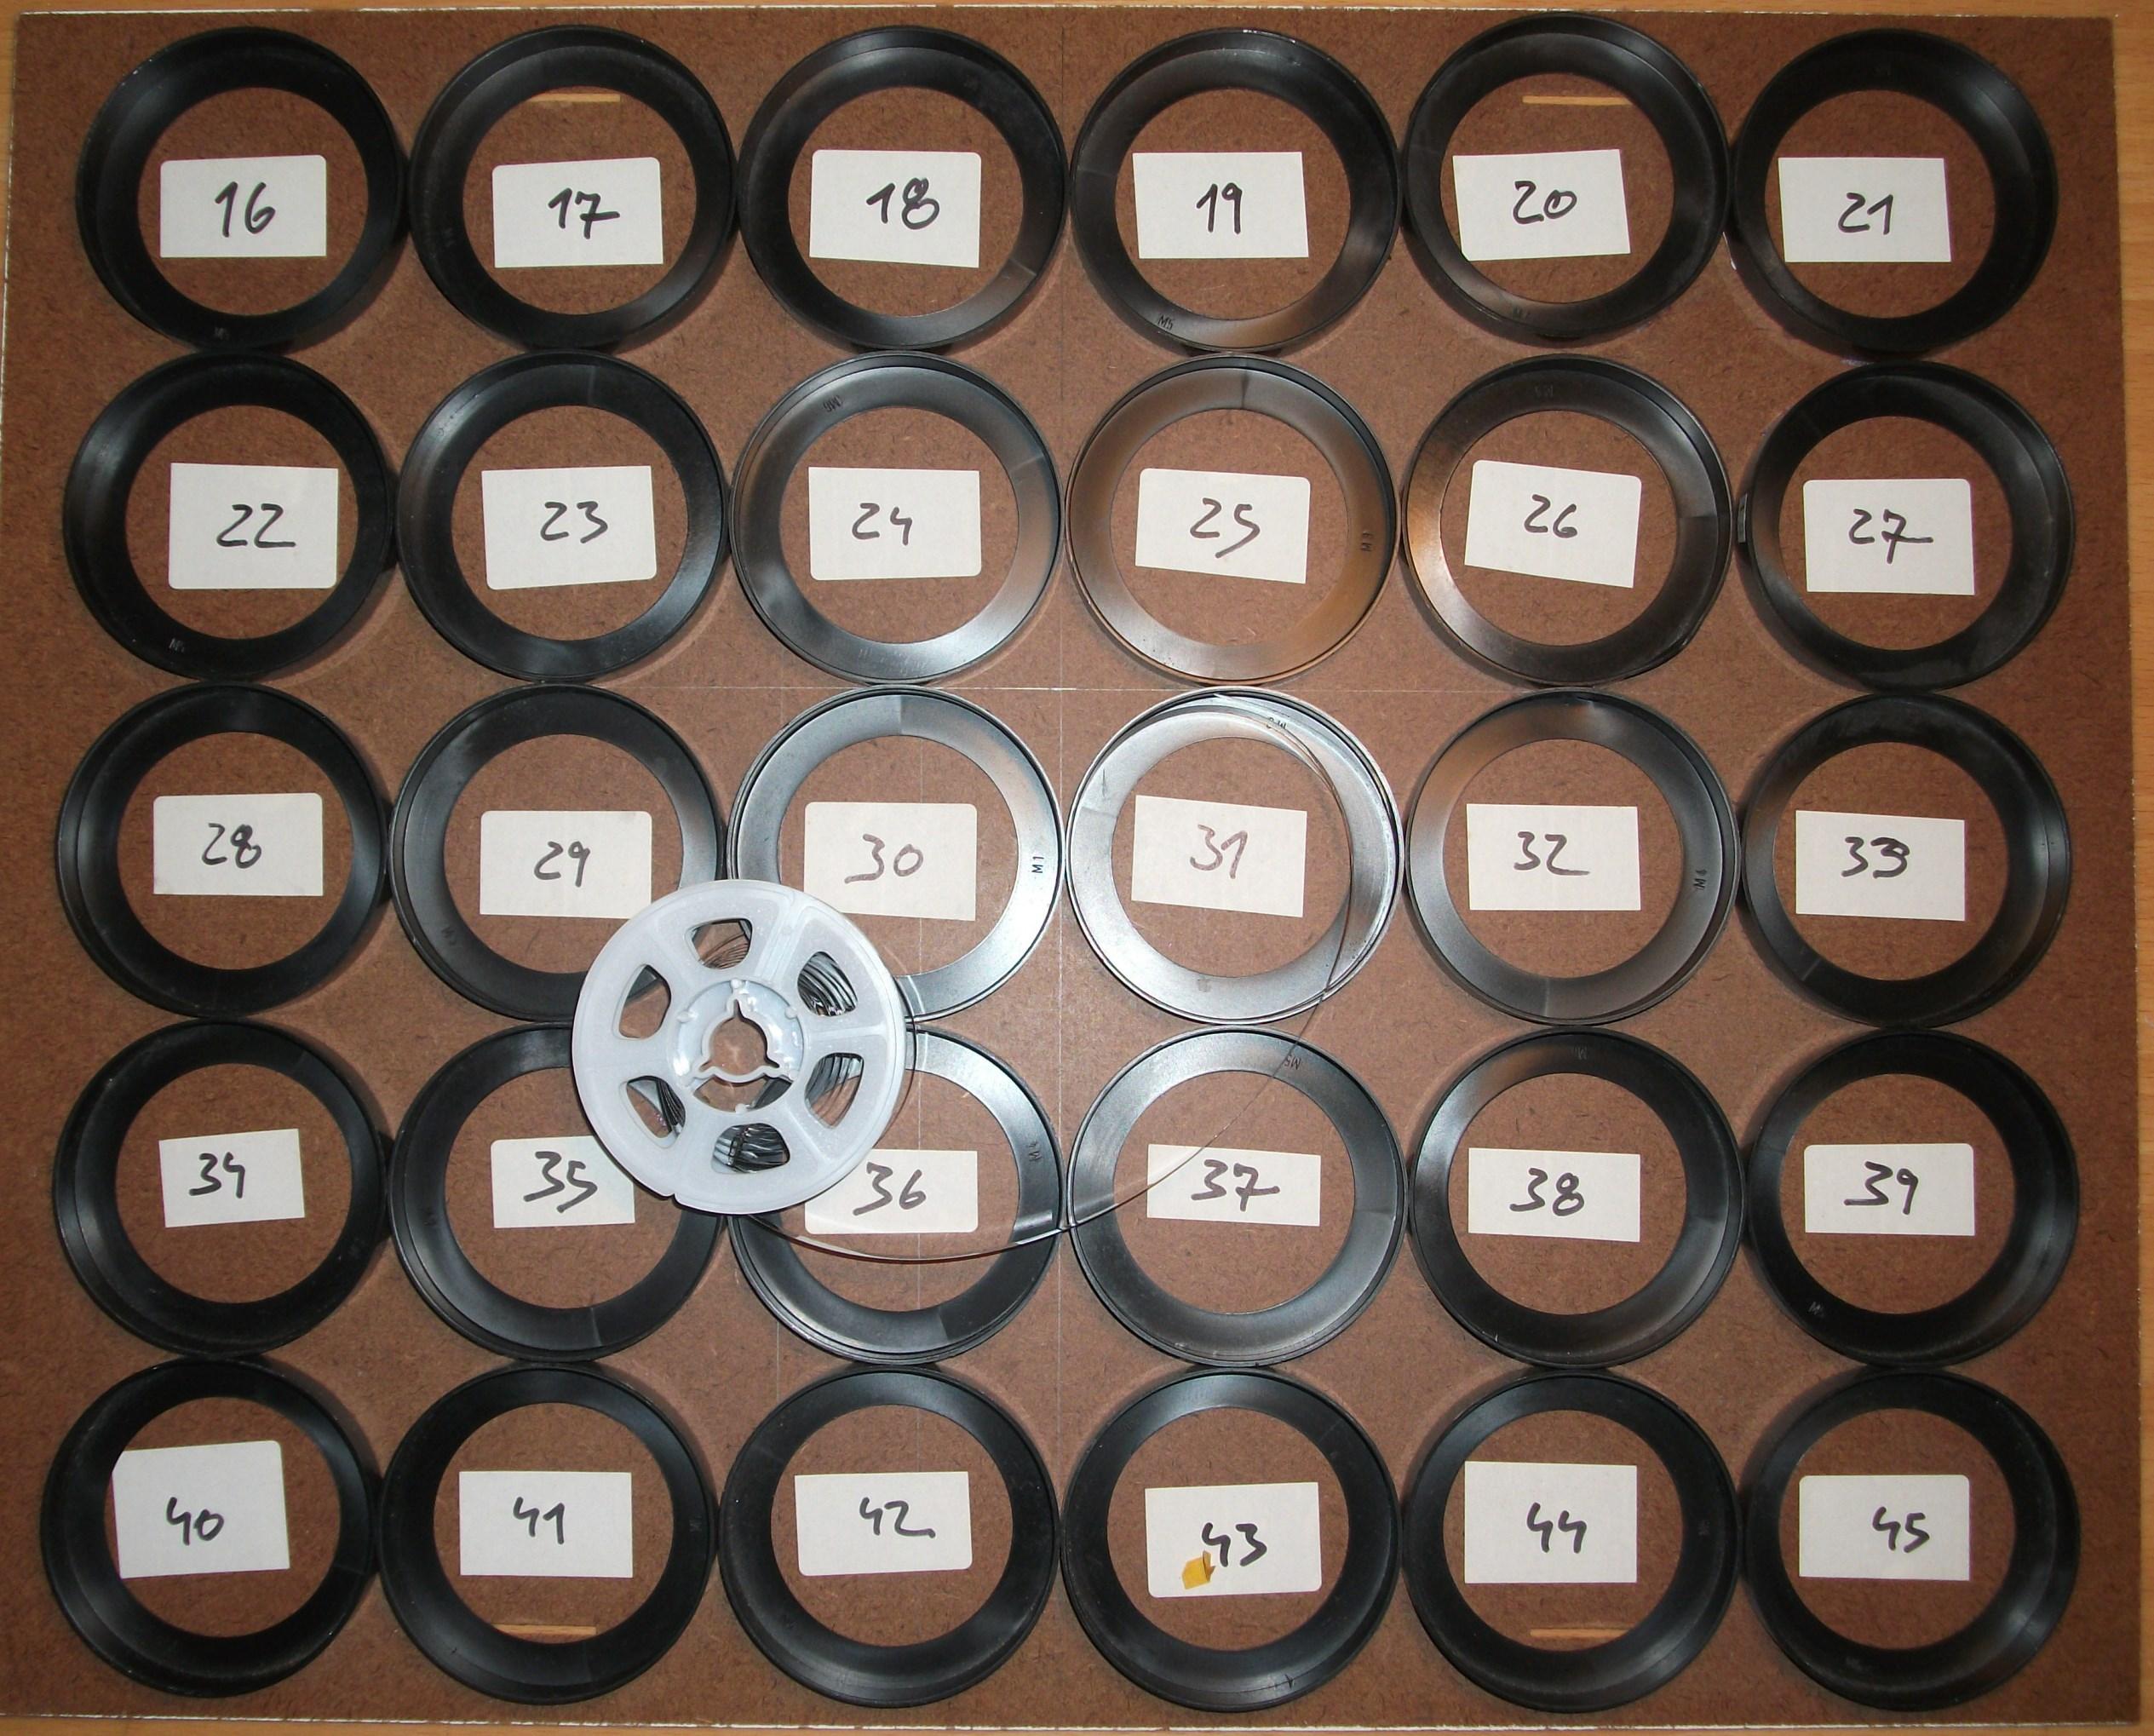 Filmsortierbrett für klassischen Filmschnitt